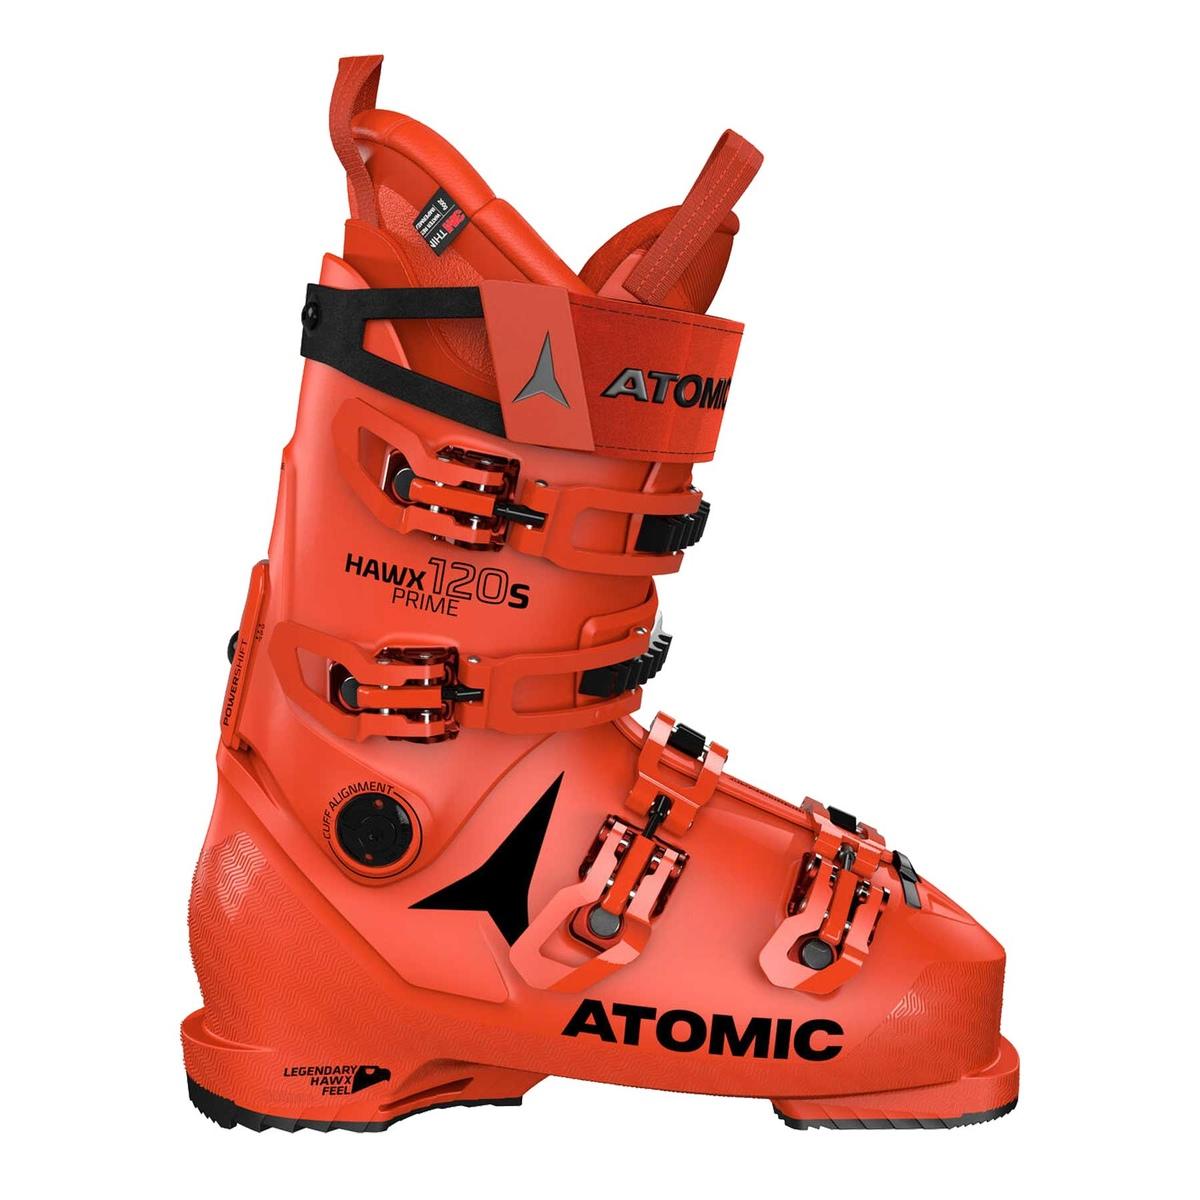 Prezzi Atomic hawx prime 120 s